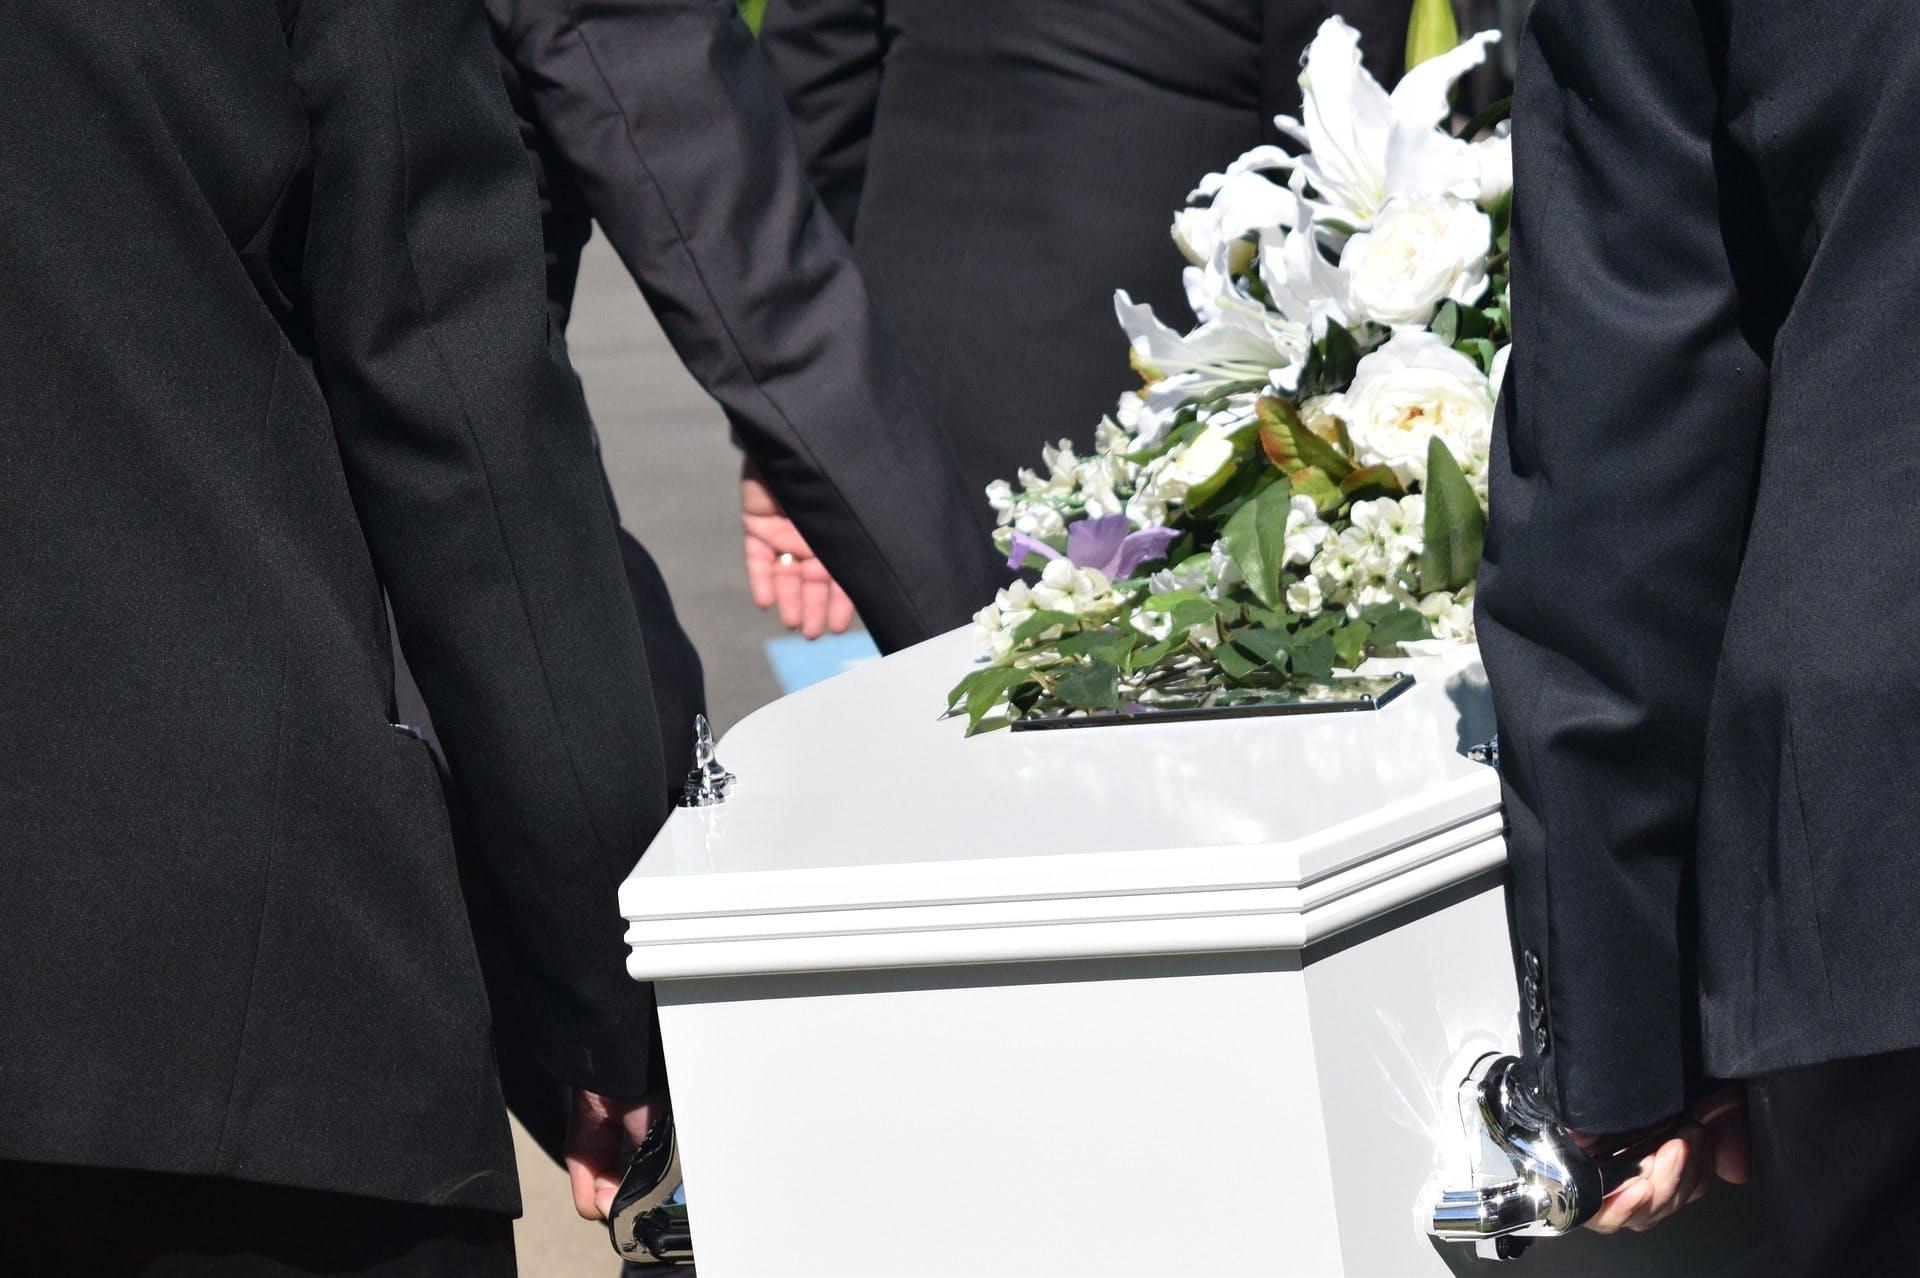 funeral-flower-black